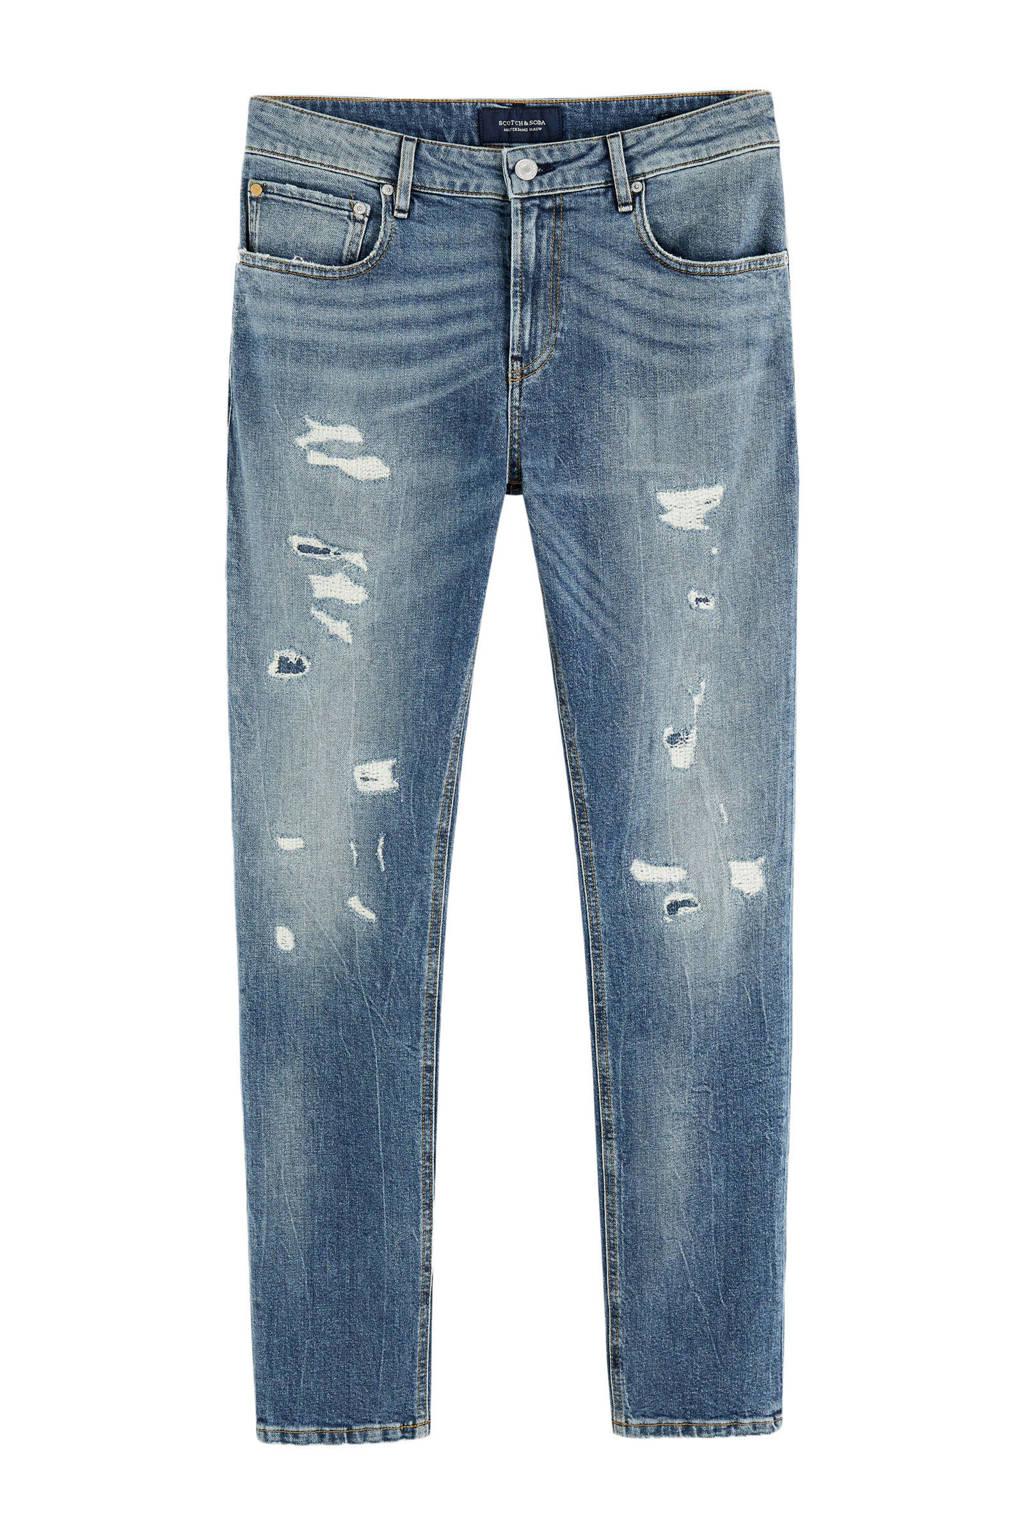 Scotch & Soda skinny jeans Skim light denim, Light denim